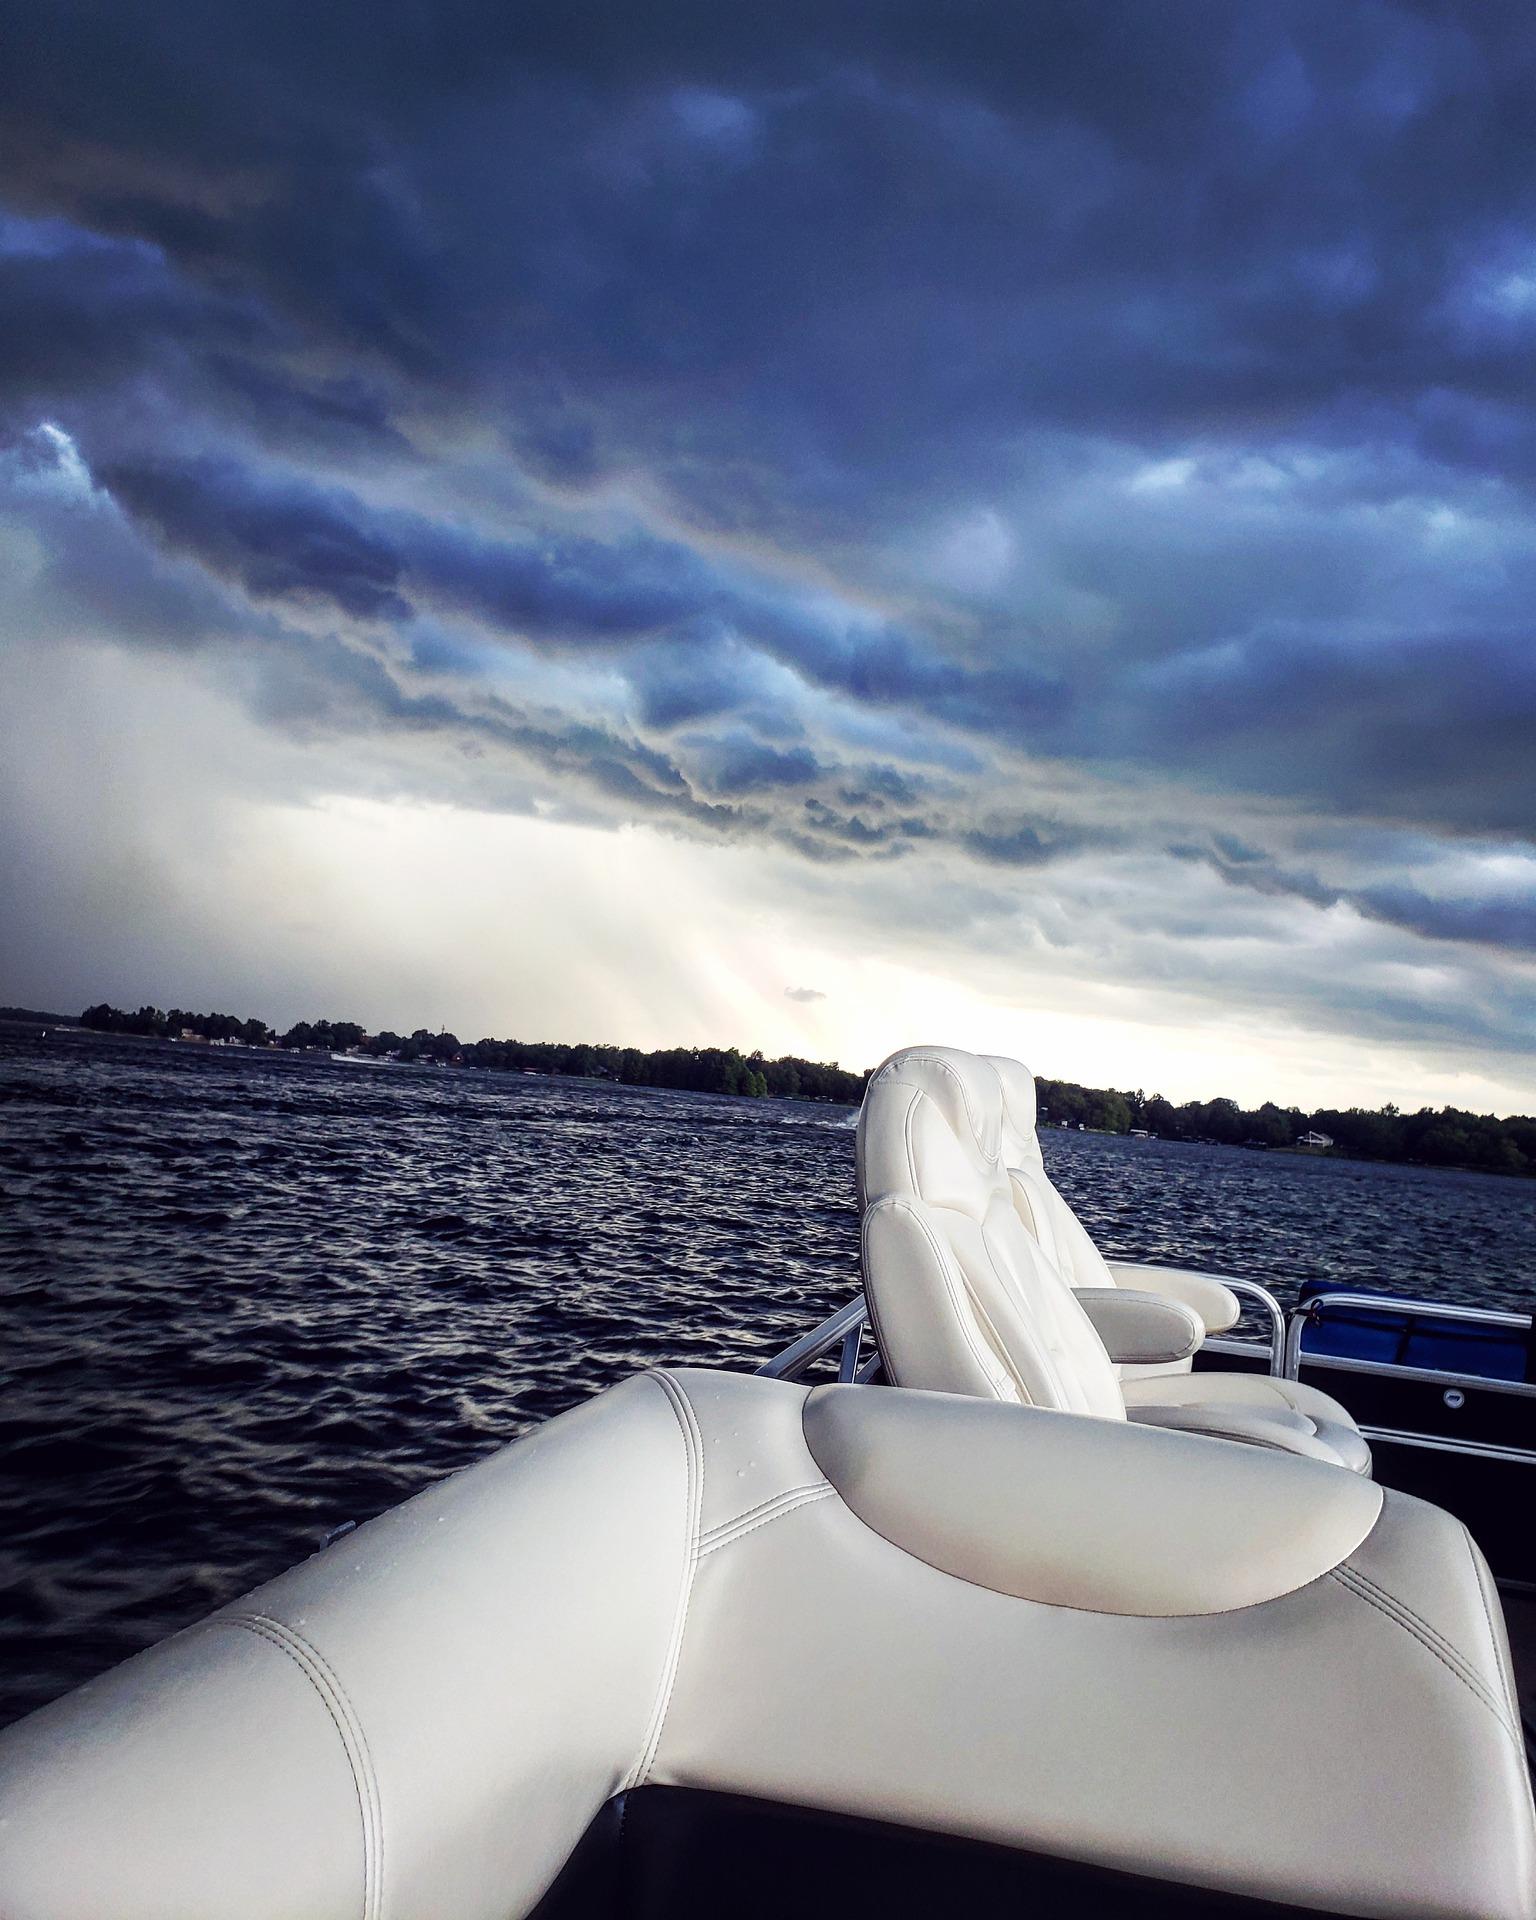 Blog_Covid storm